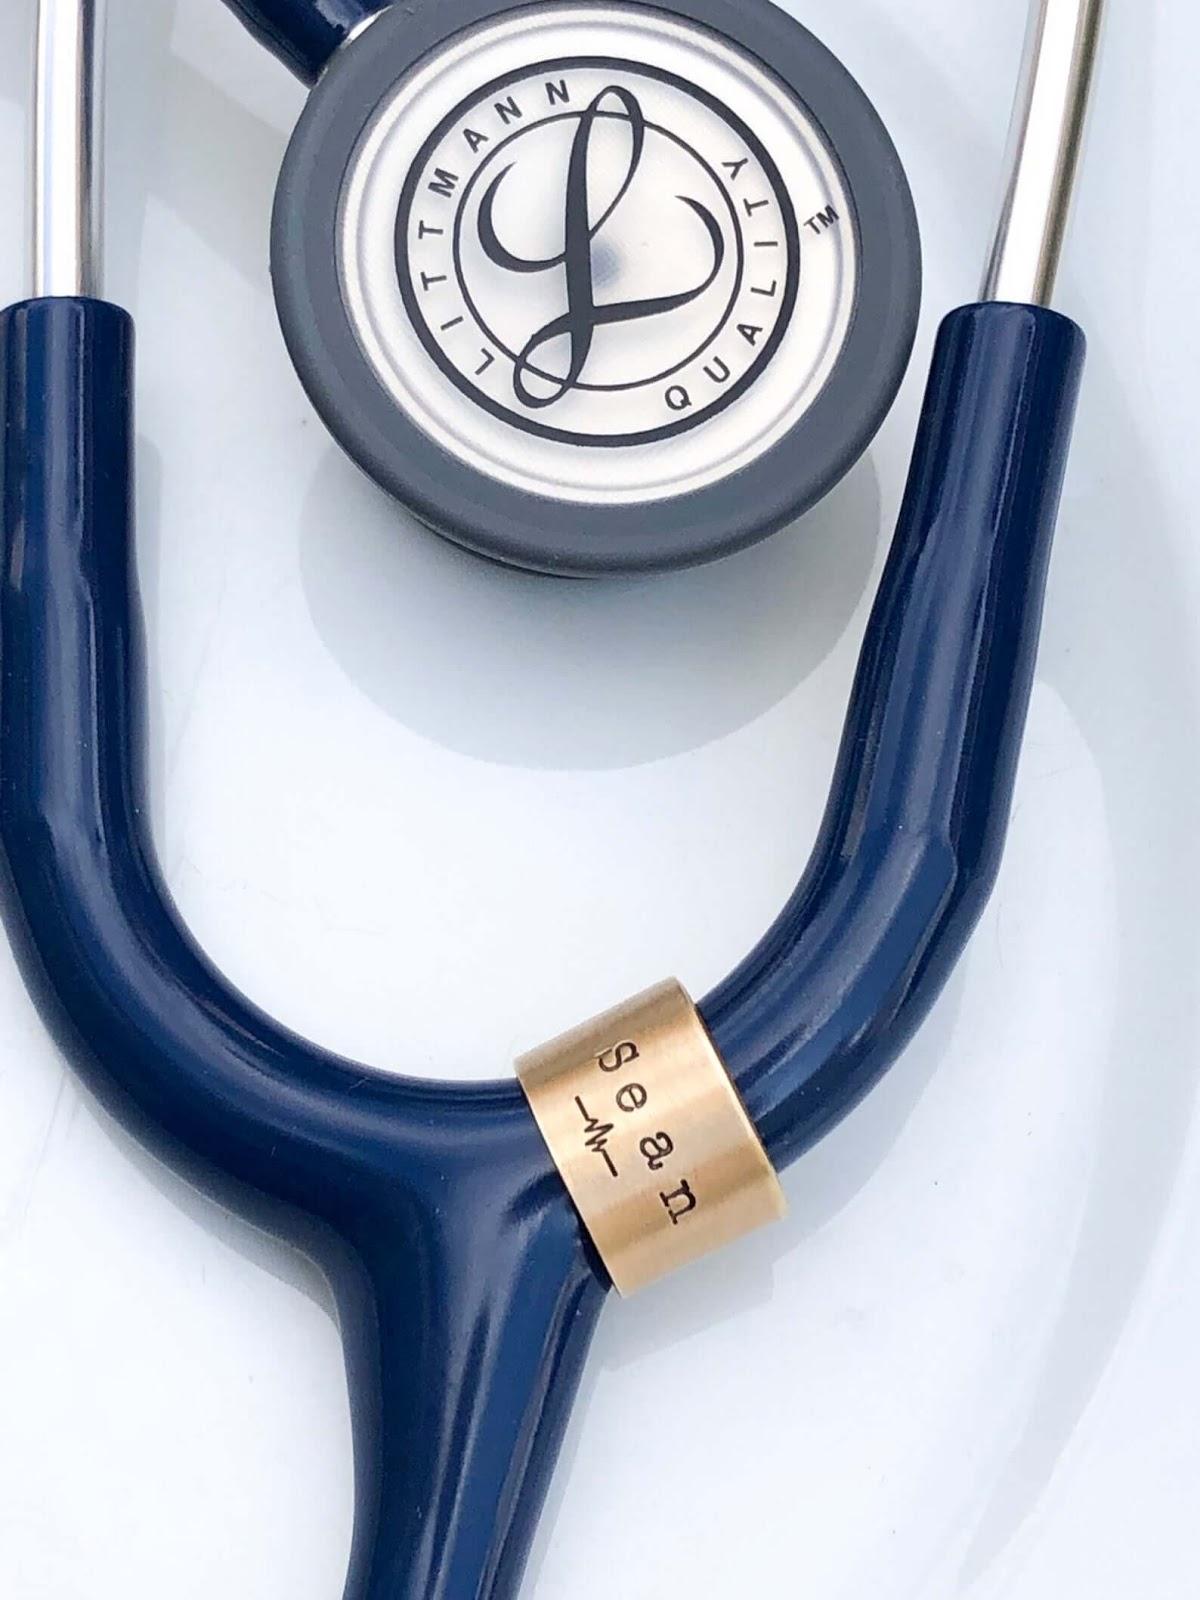 Stethoscope ID